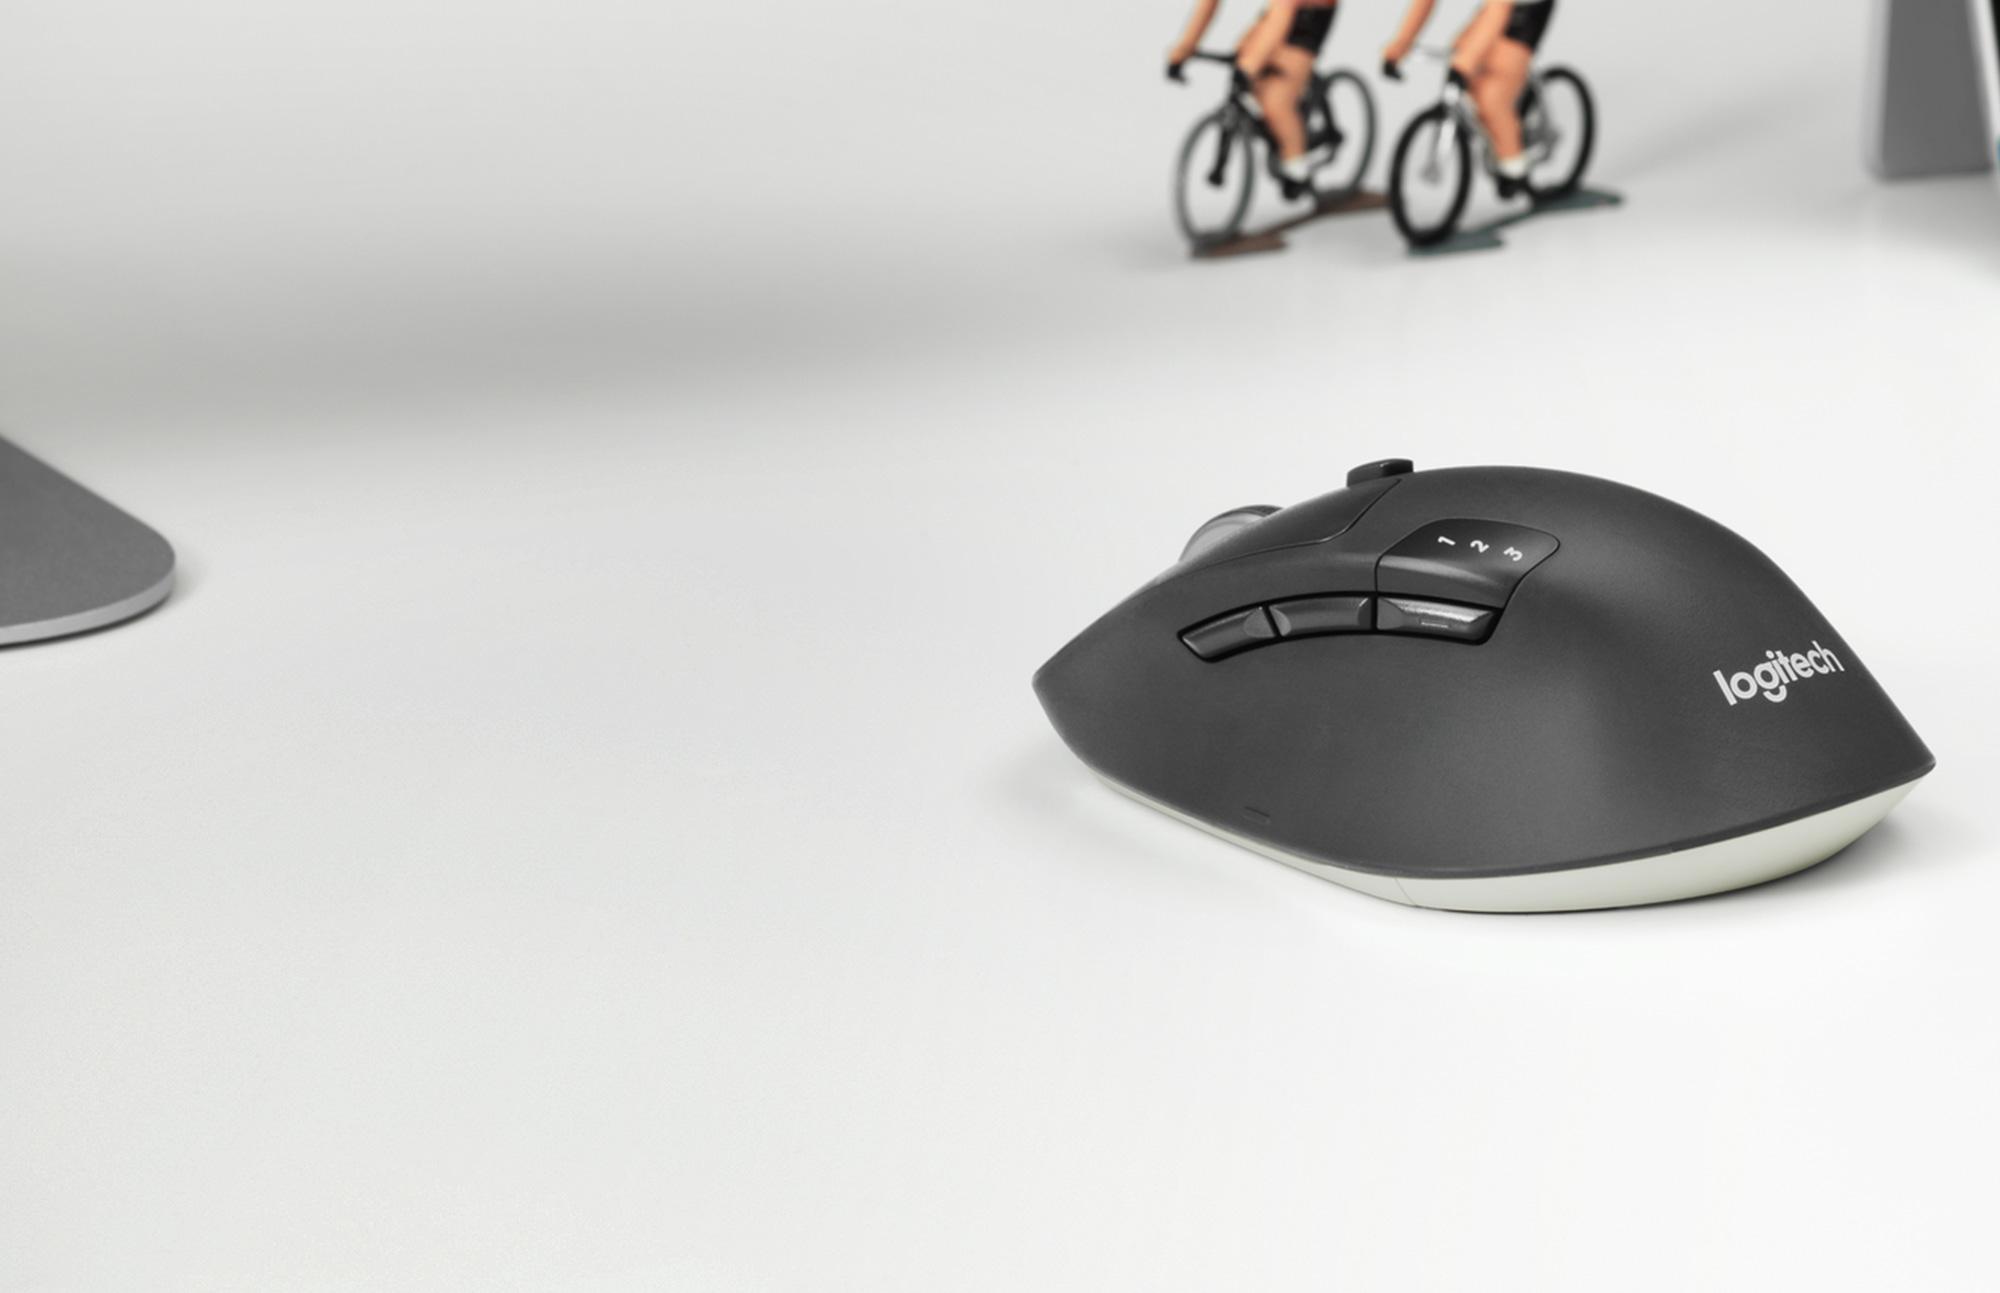 Logitech M720 Triathlon: best wireless mouse for most people